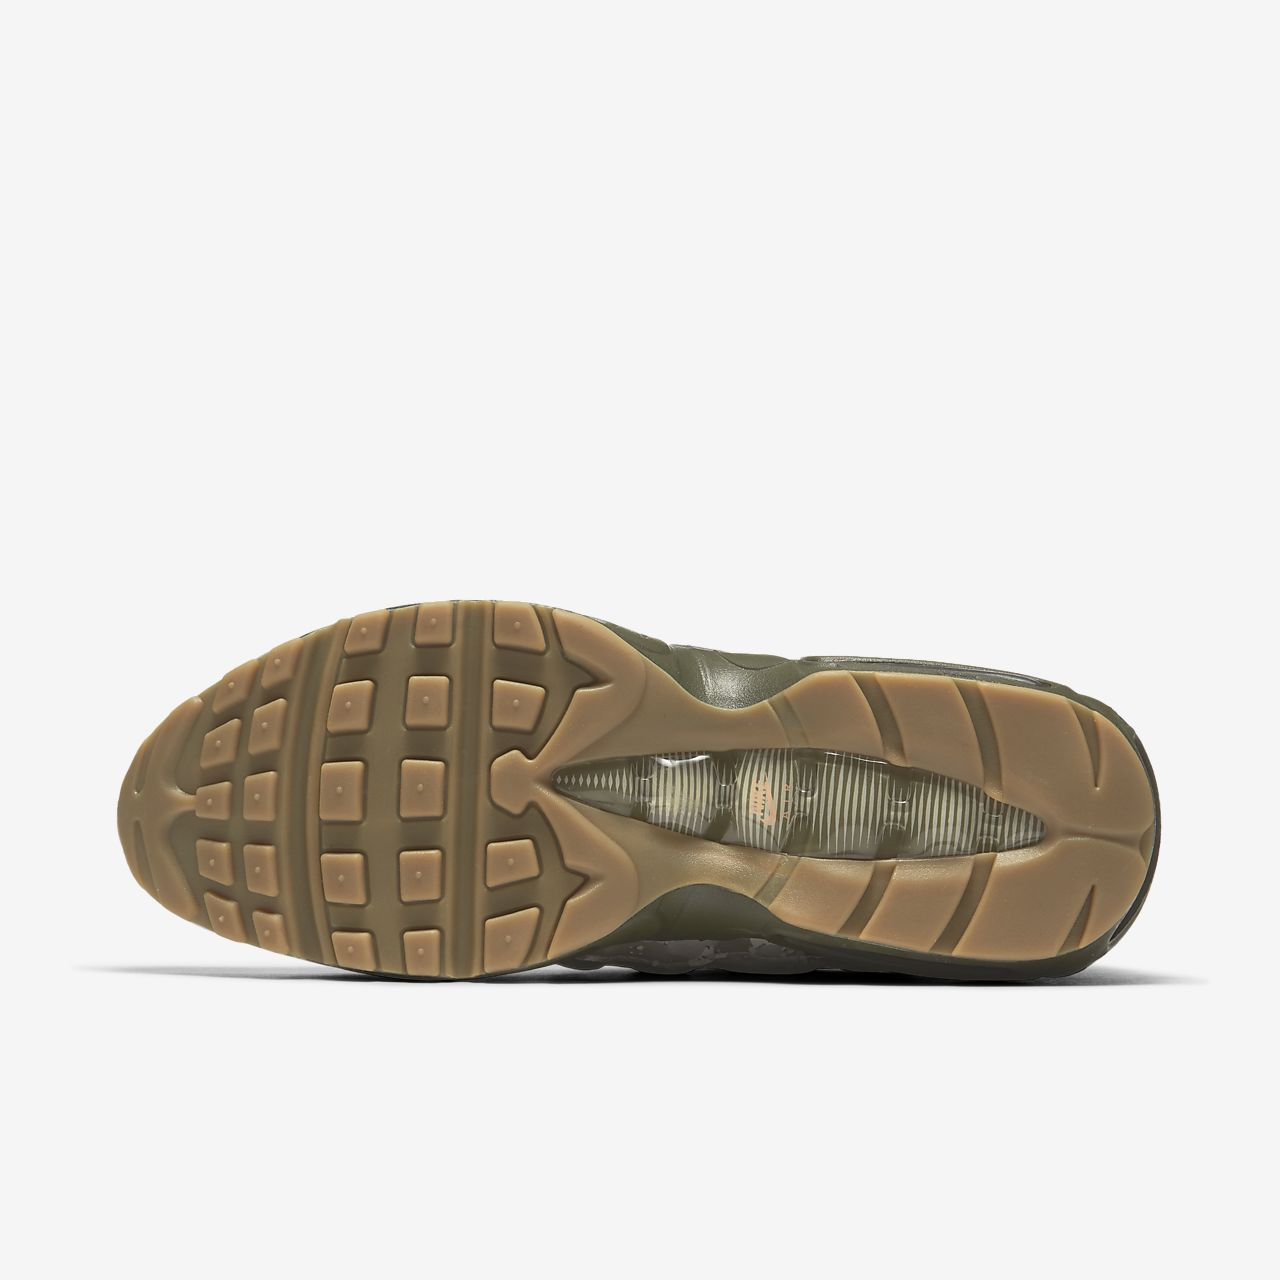 Nike Air Max 95 Essential Camo Men's Shoe